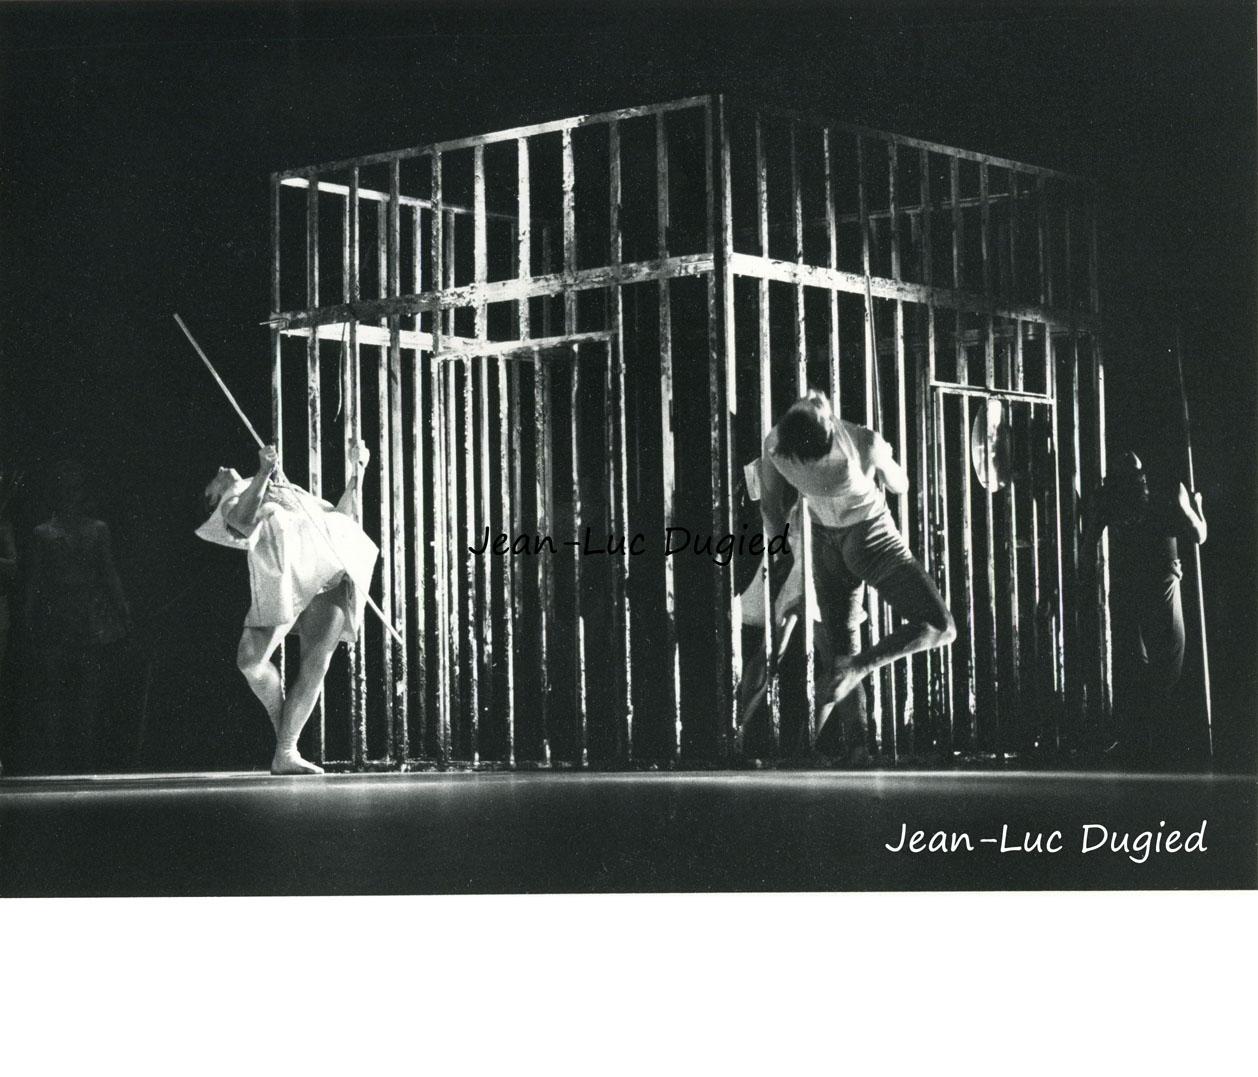 43 Saporta Karine - le coeur métamorphosé - 1986